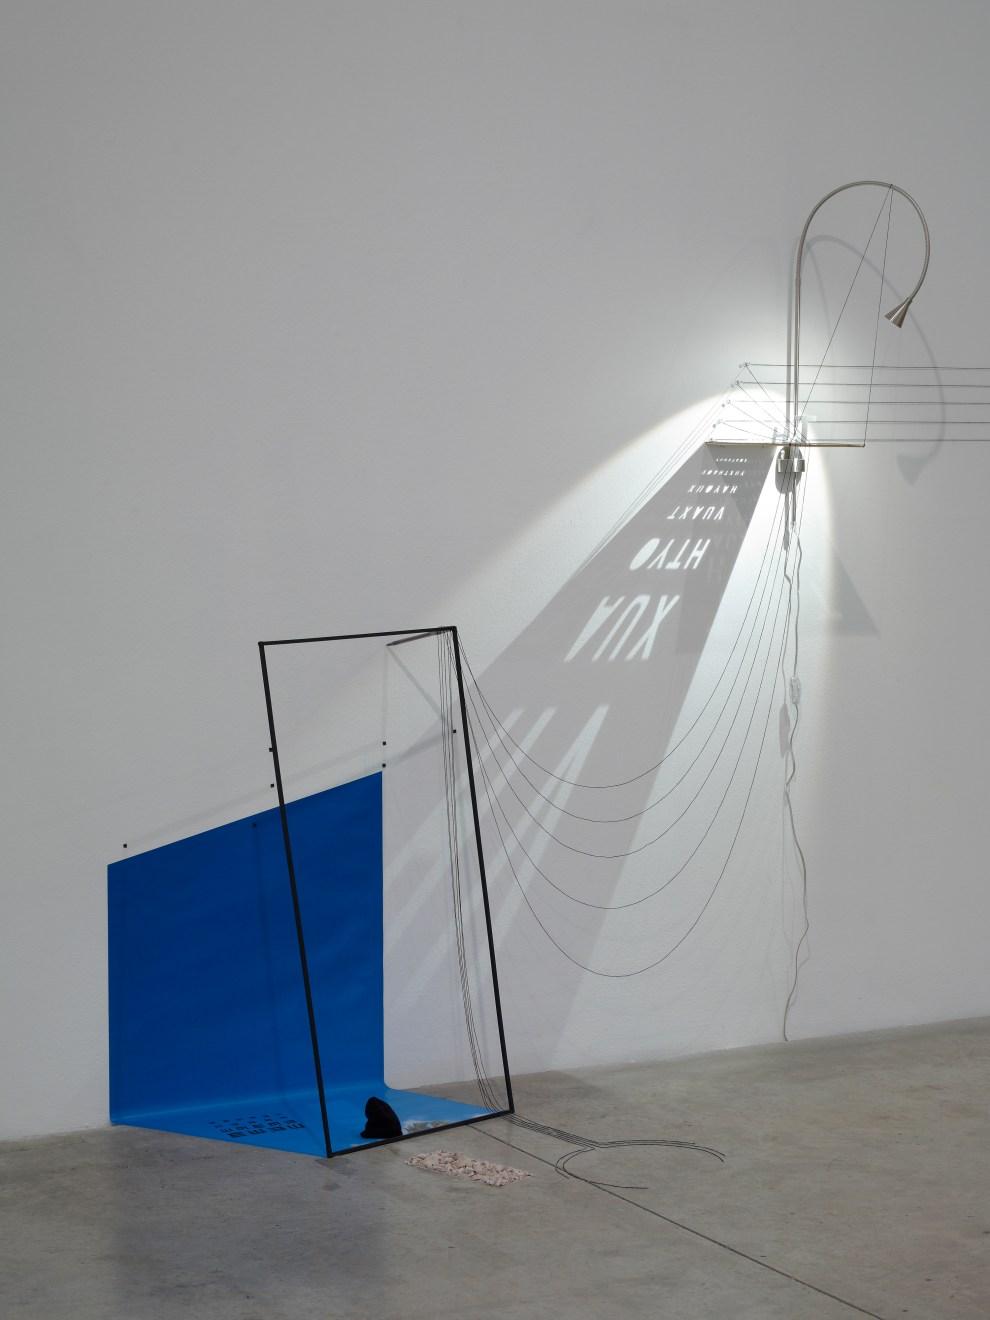 Sarah Sze, Victoria Miro Gallery, Positive Magazine, London